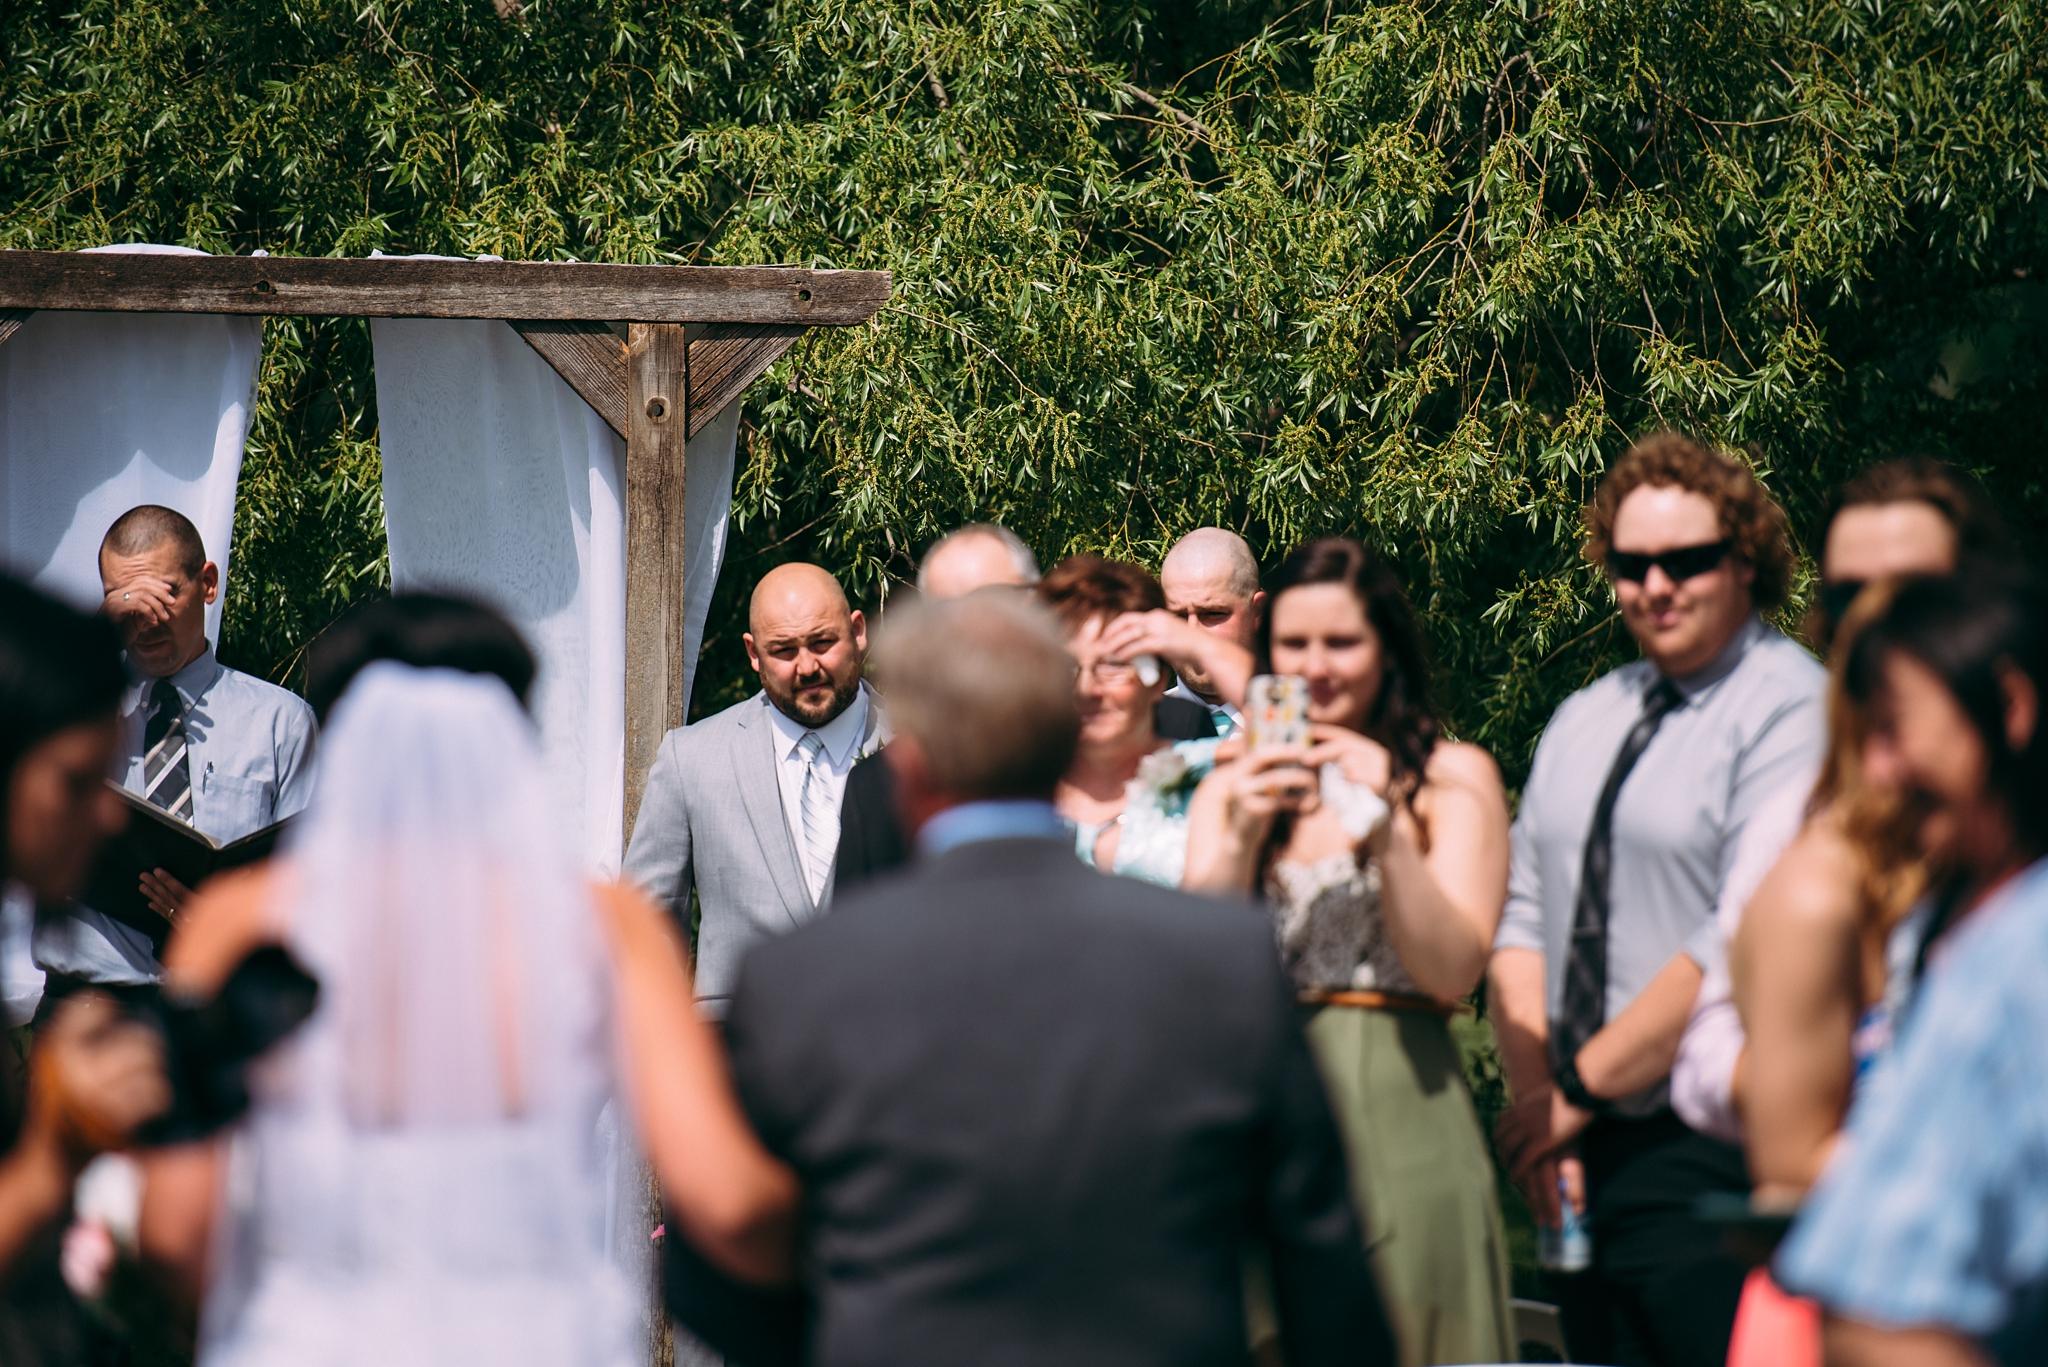 kaihla_tonai_intimate_wedding_elopement_photographer_1517